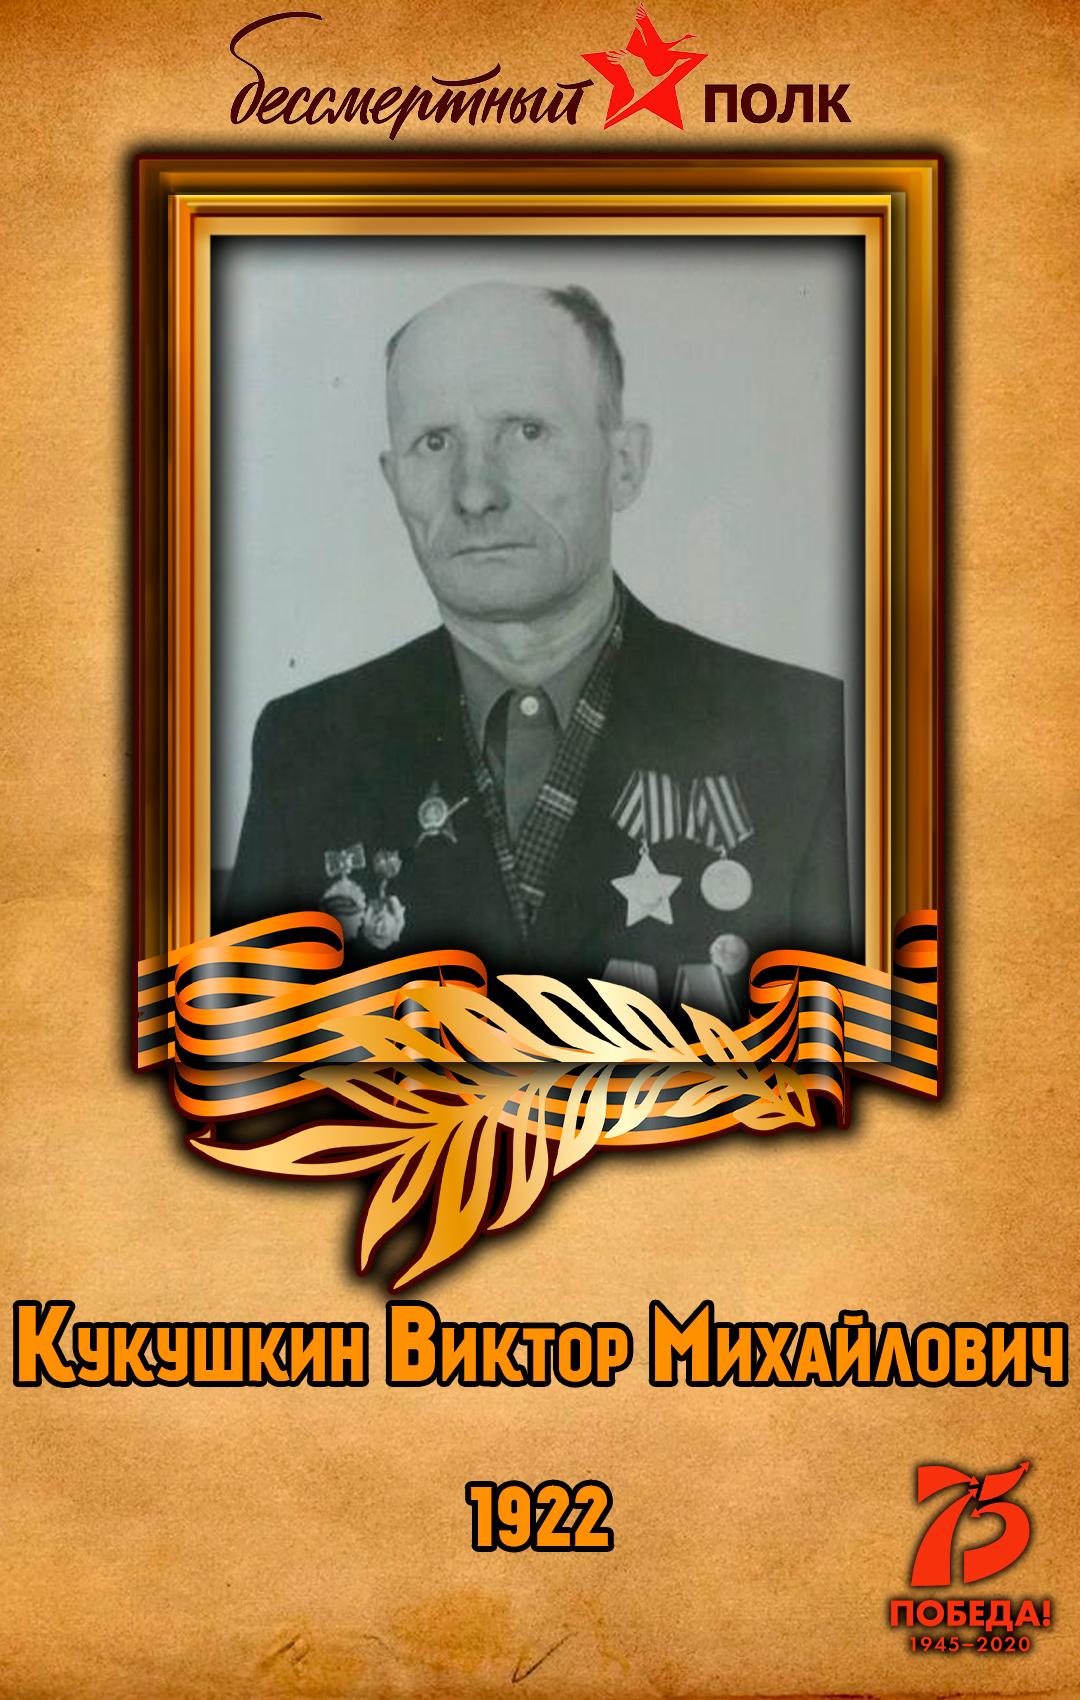 Кукушкин-Виктор-Михайлович